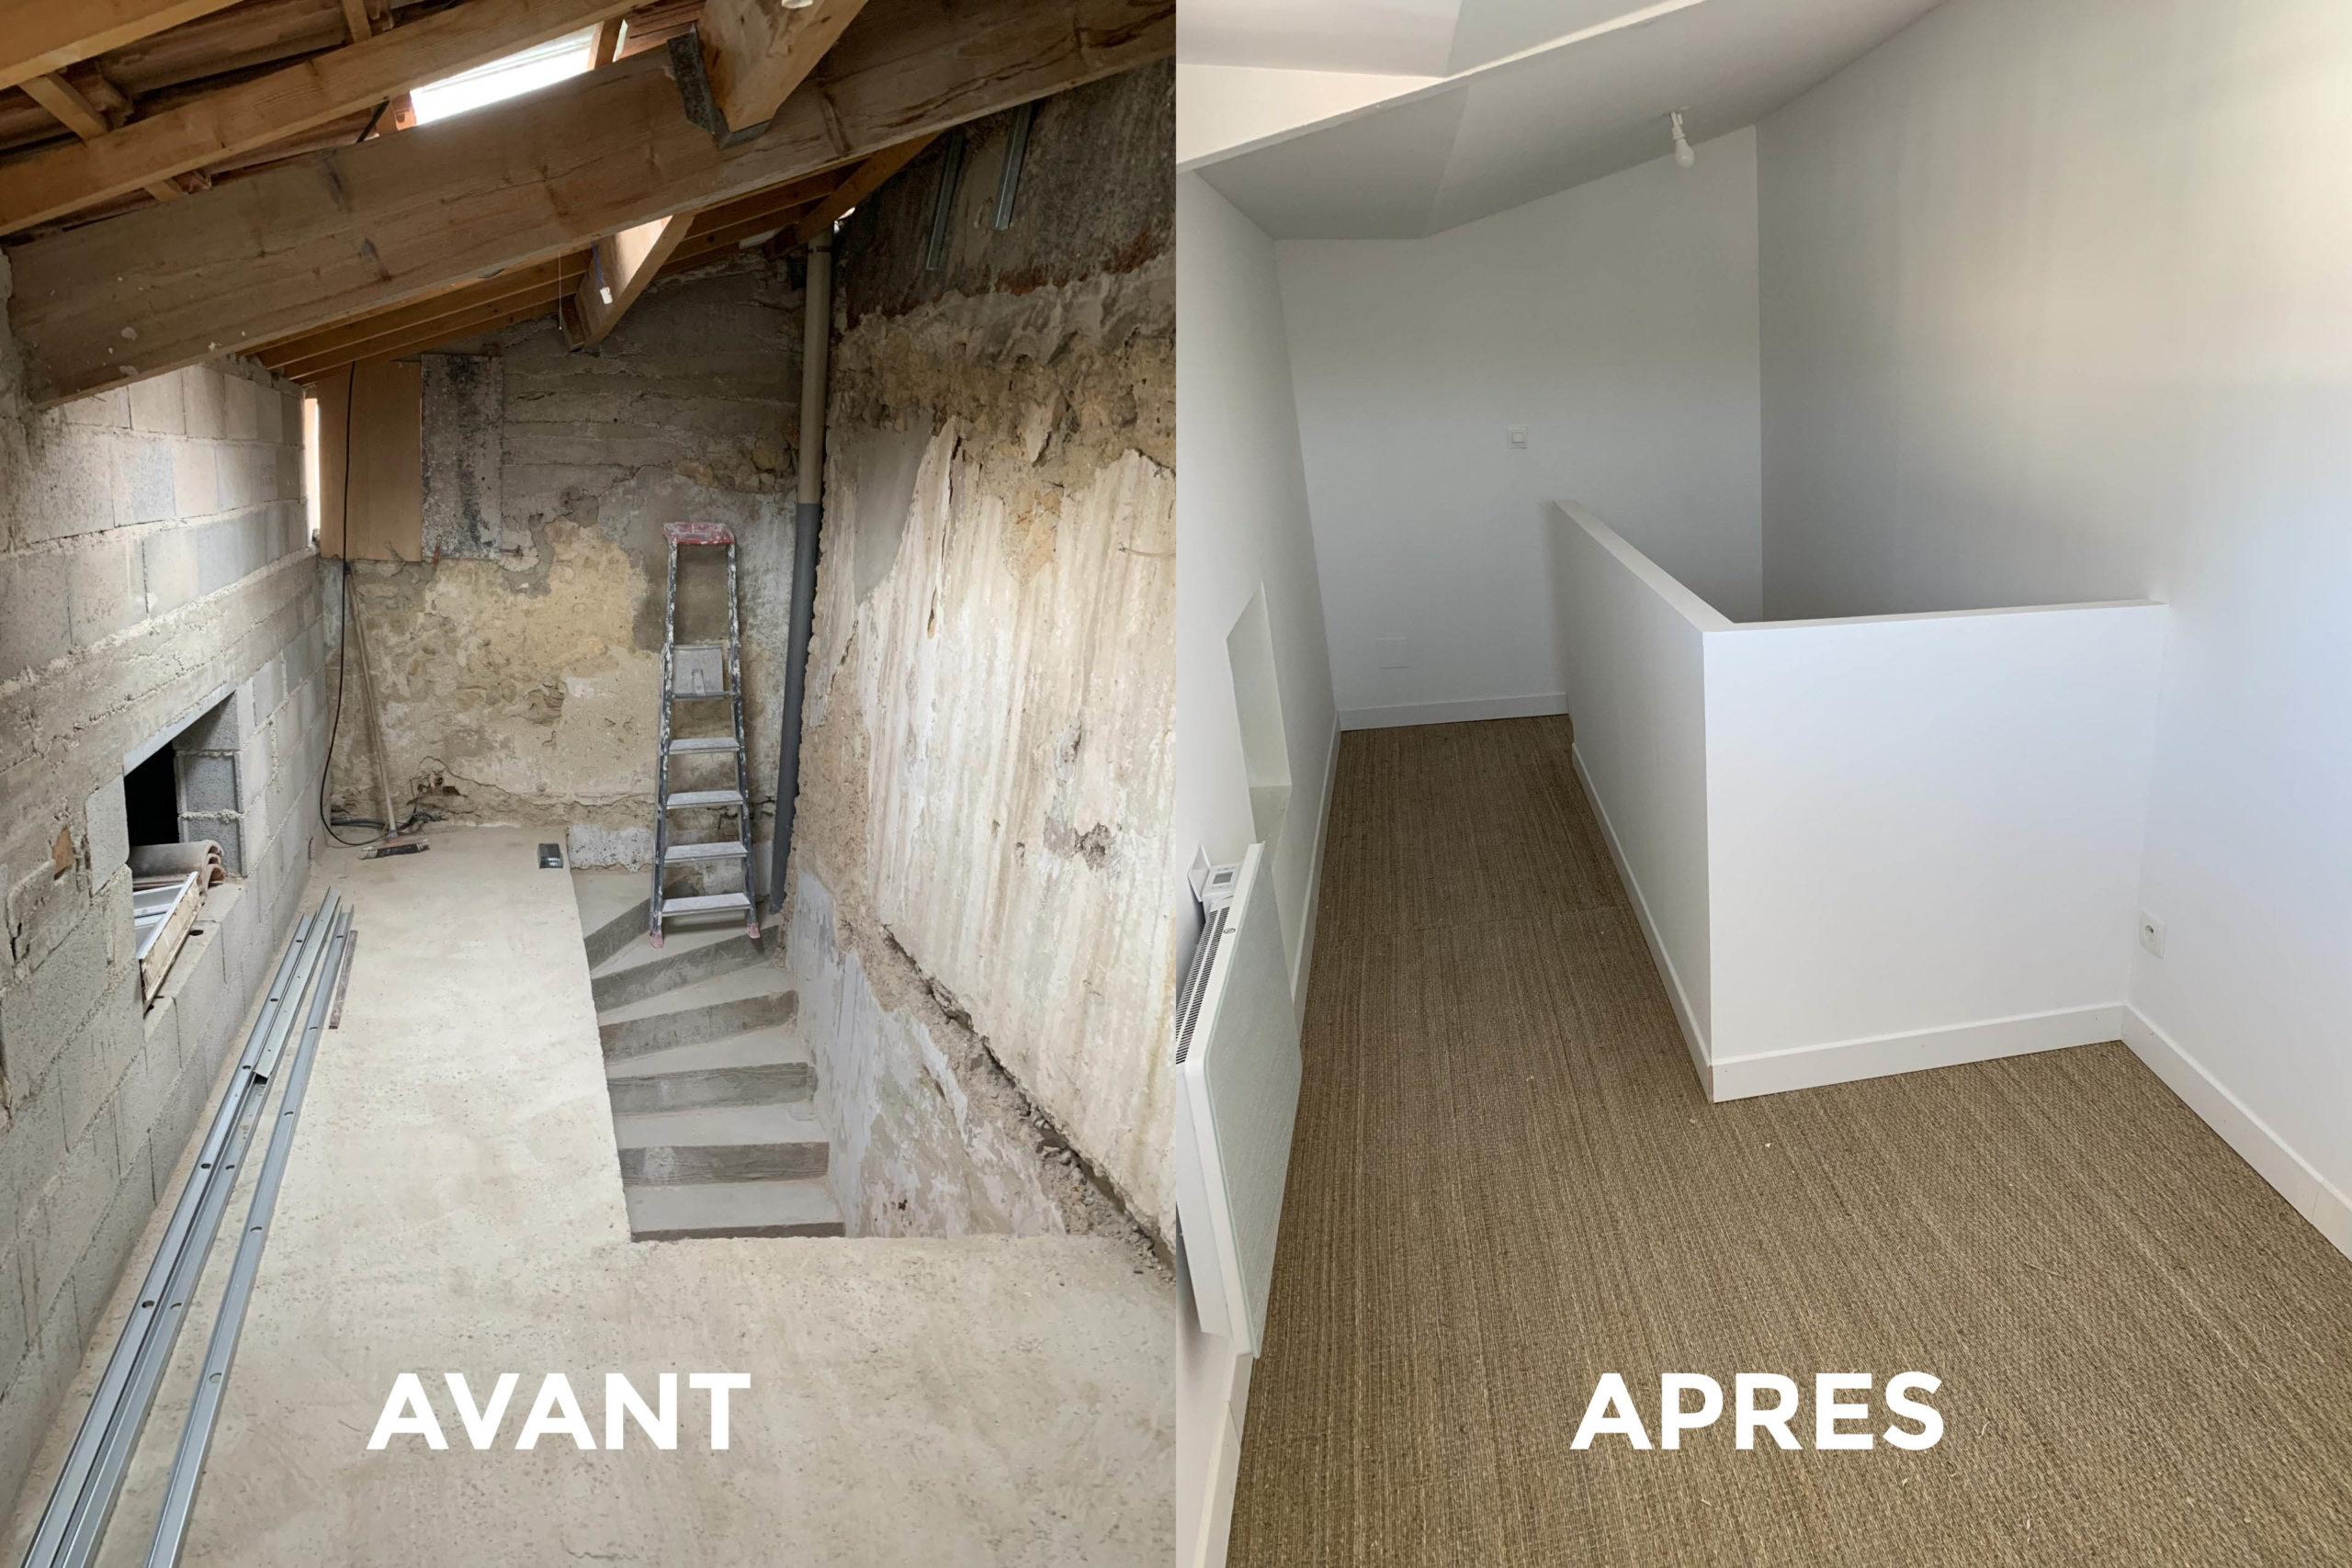 Appartement-avant-apres